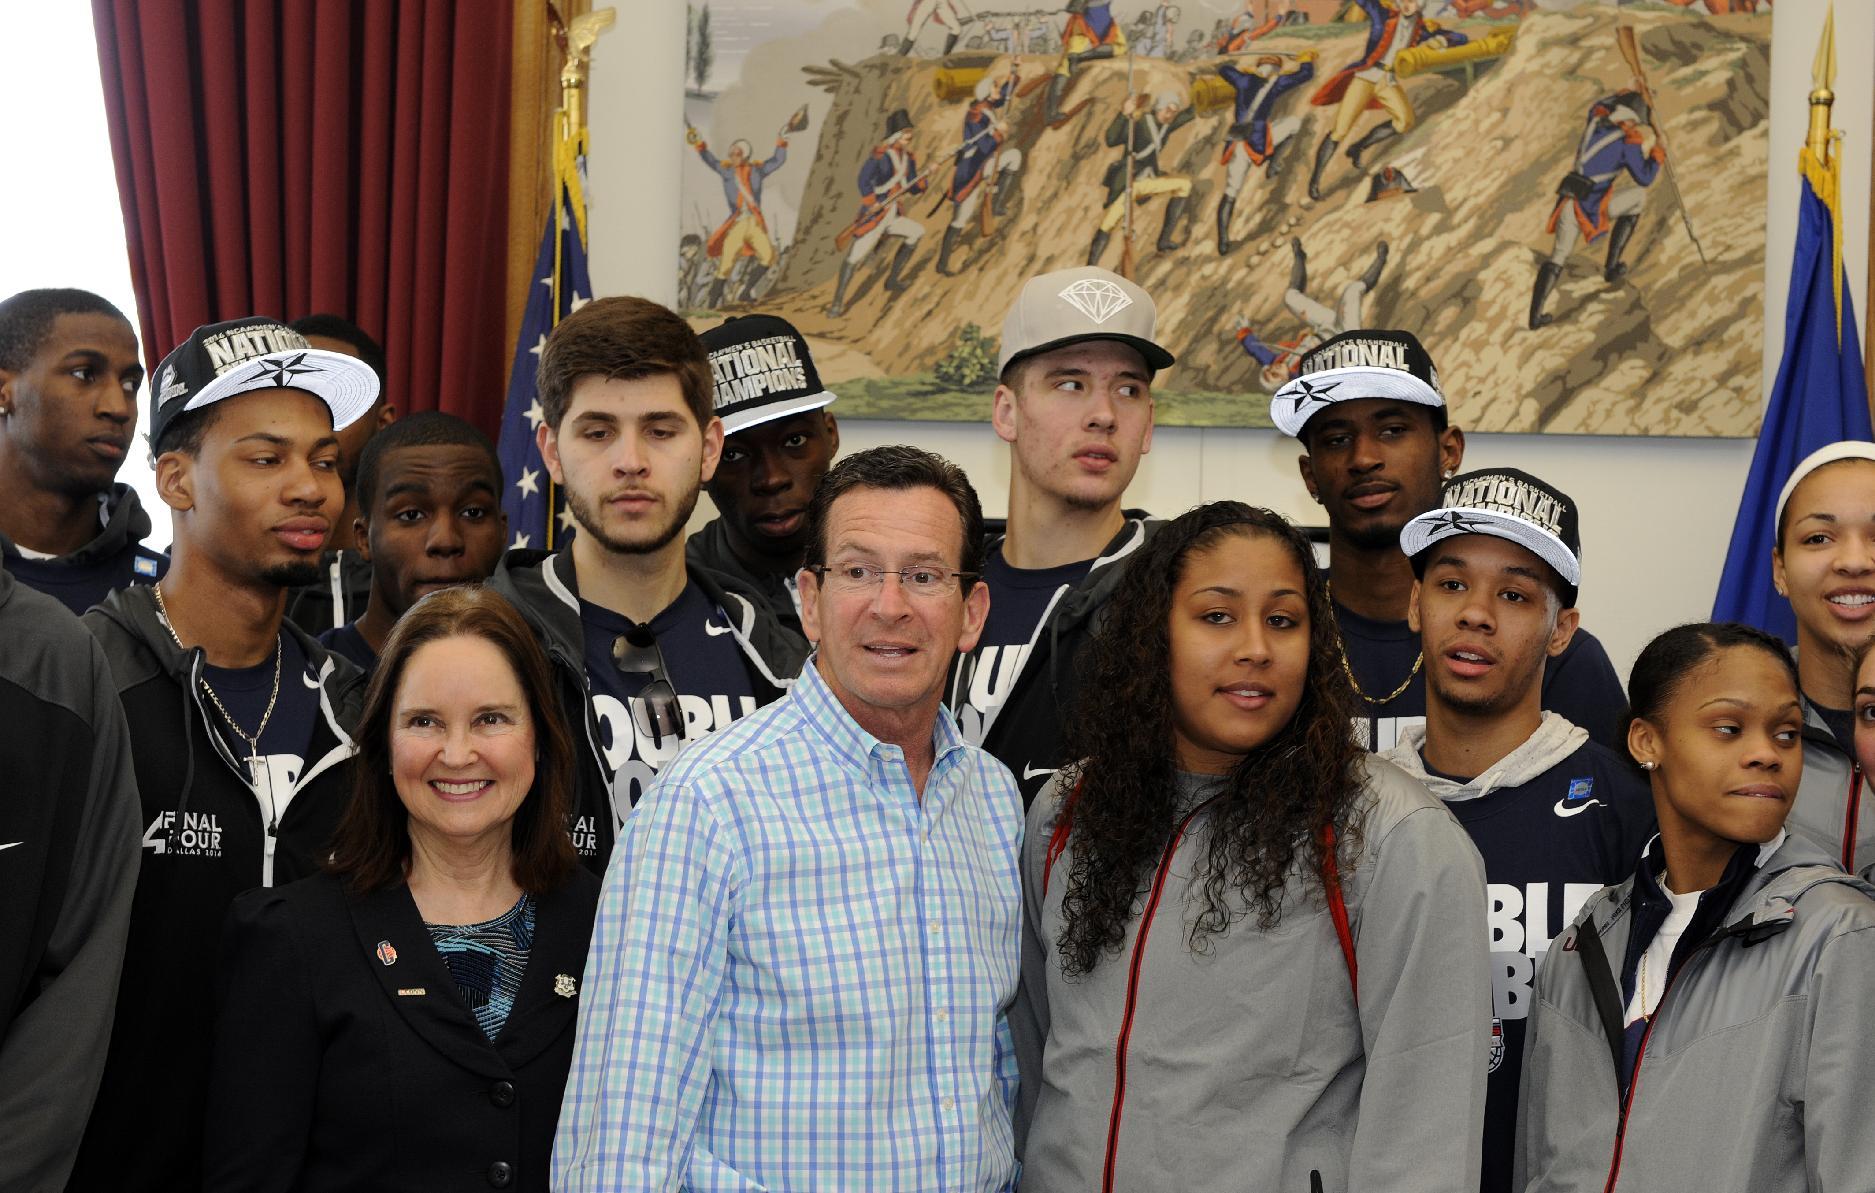 Over 200,000 cheer UConn champion basketball teams